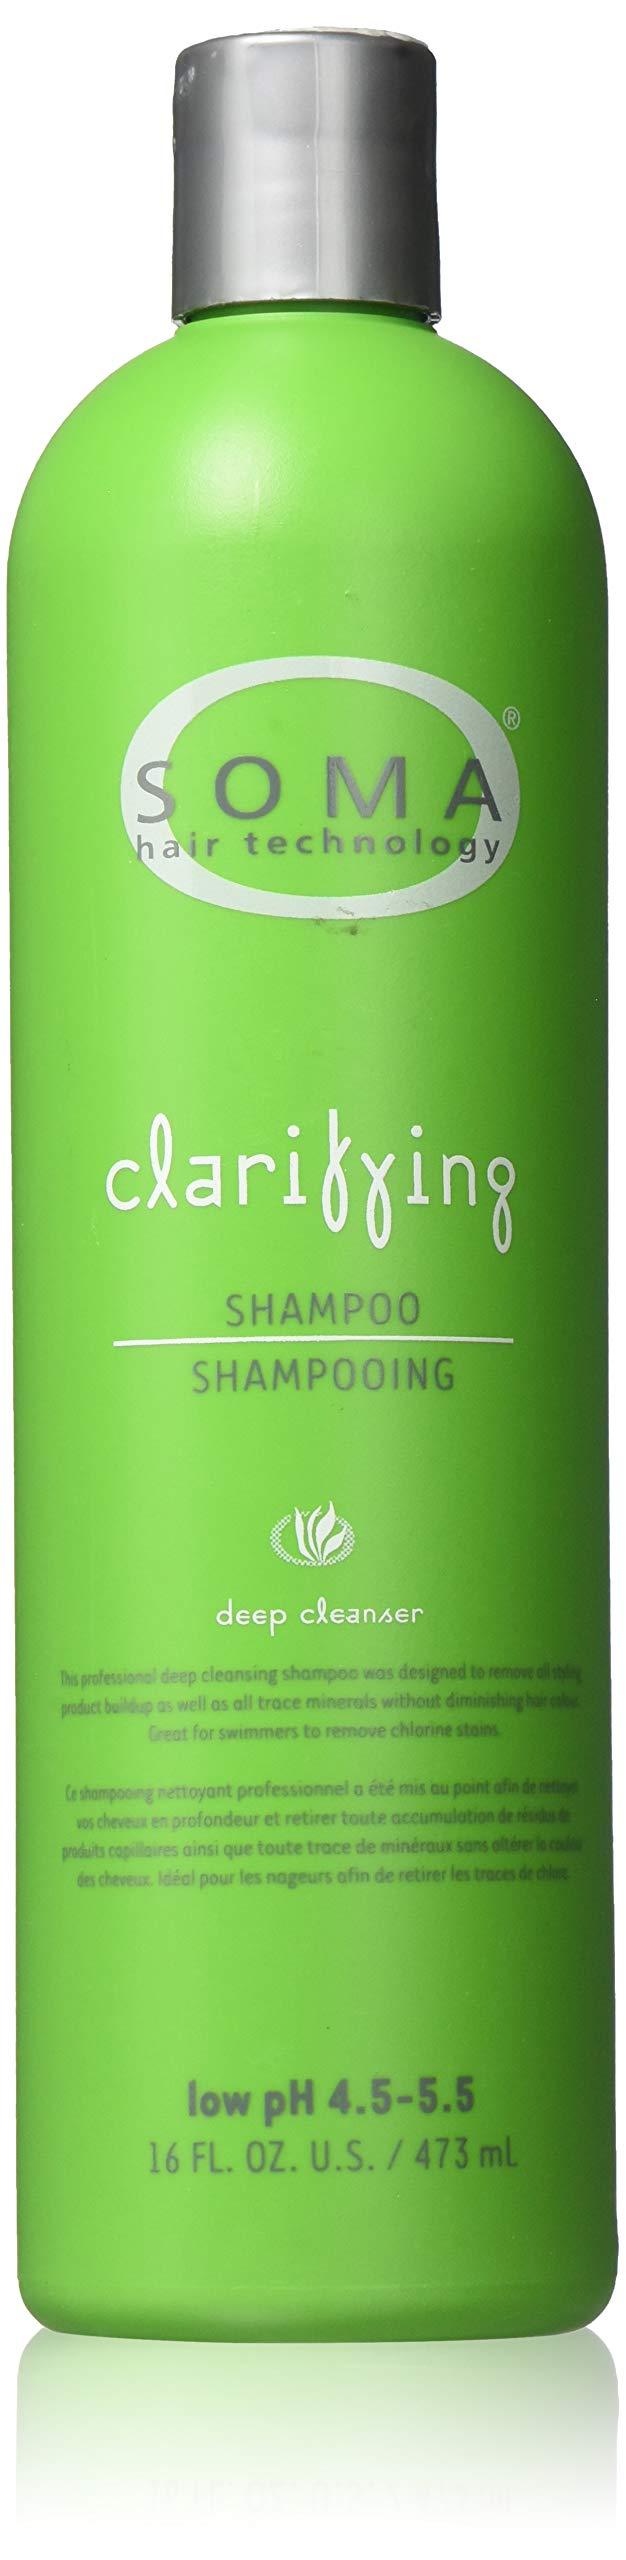 Soma Clarifying Shampoo [16 oz.] by Soma